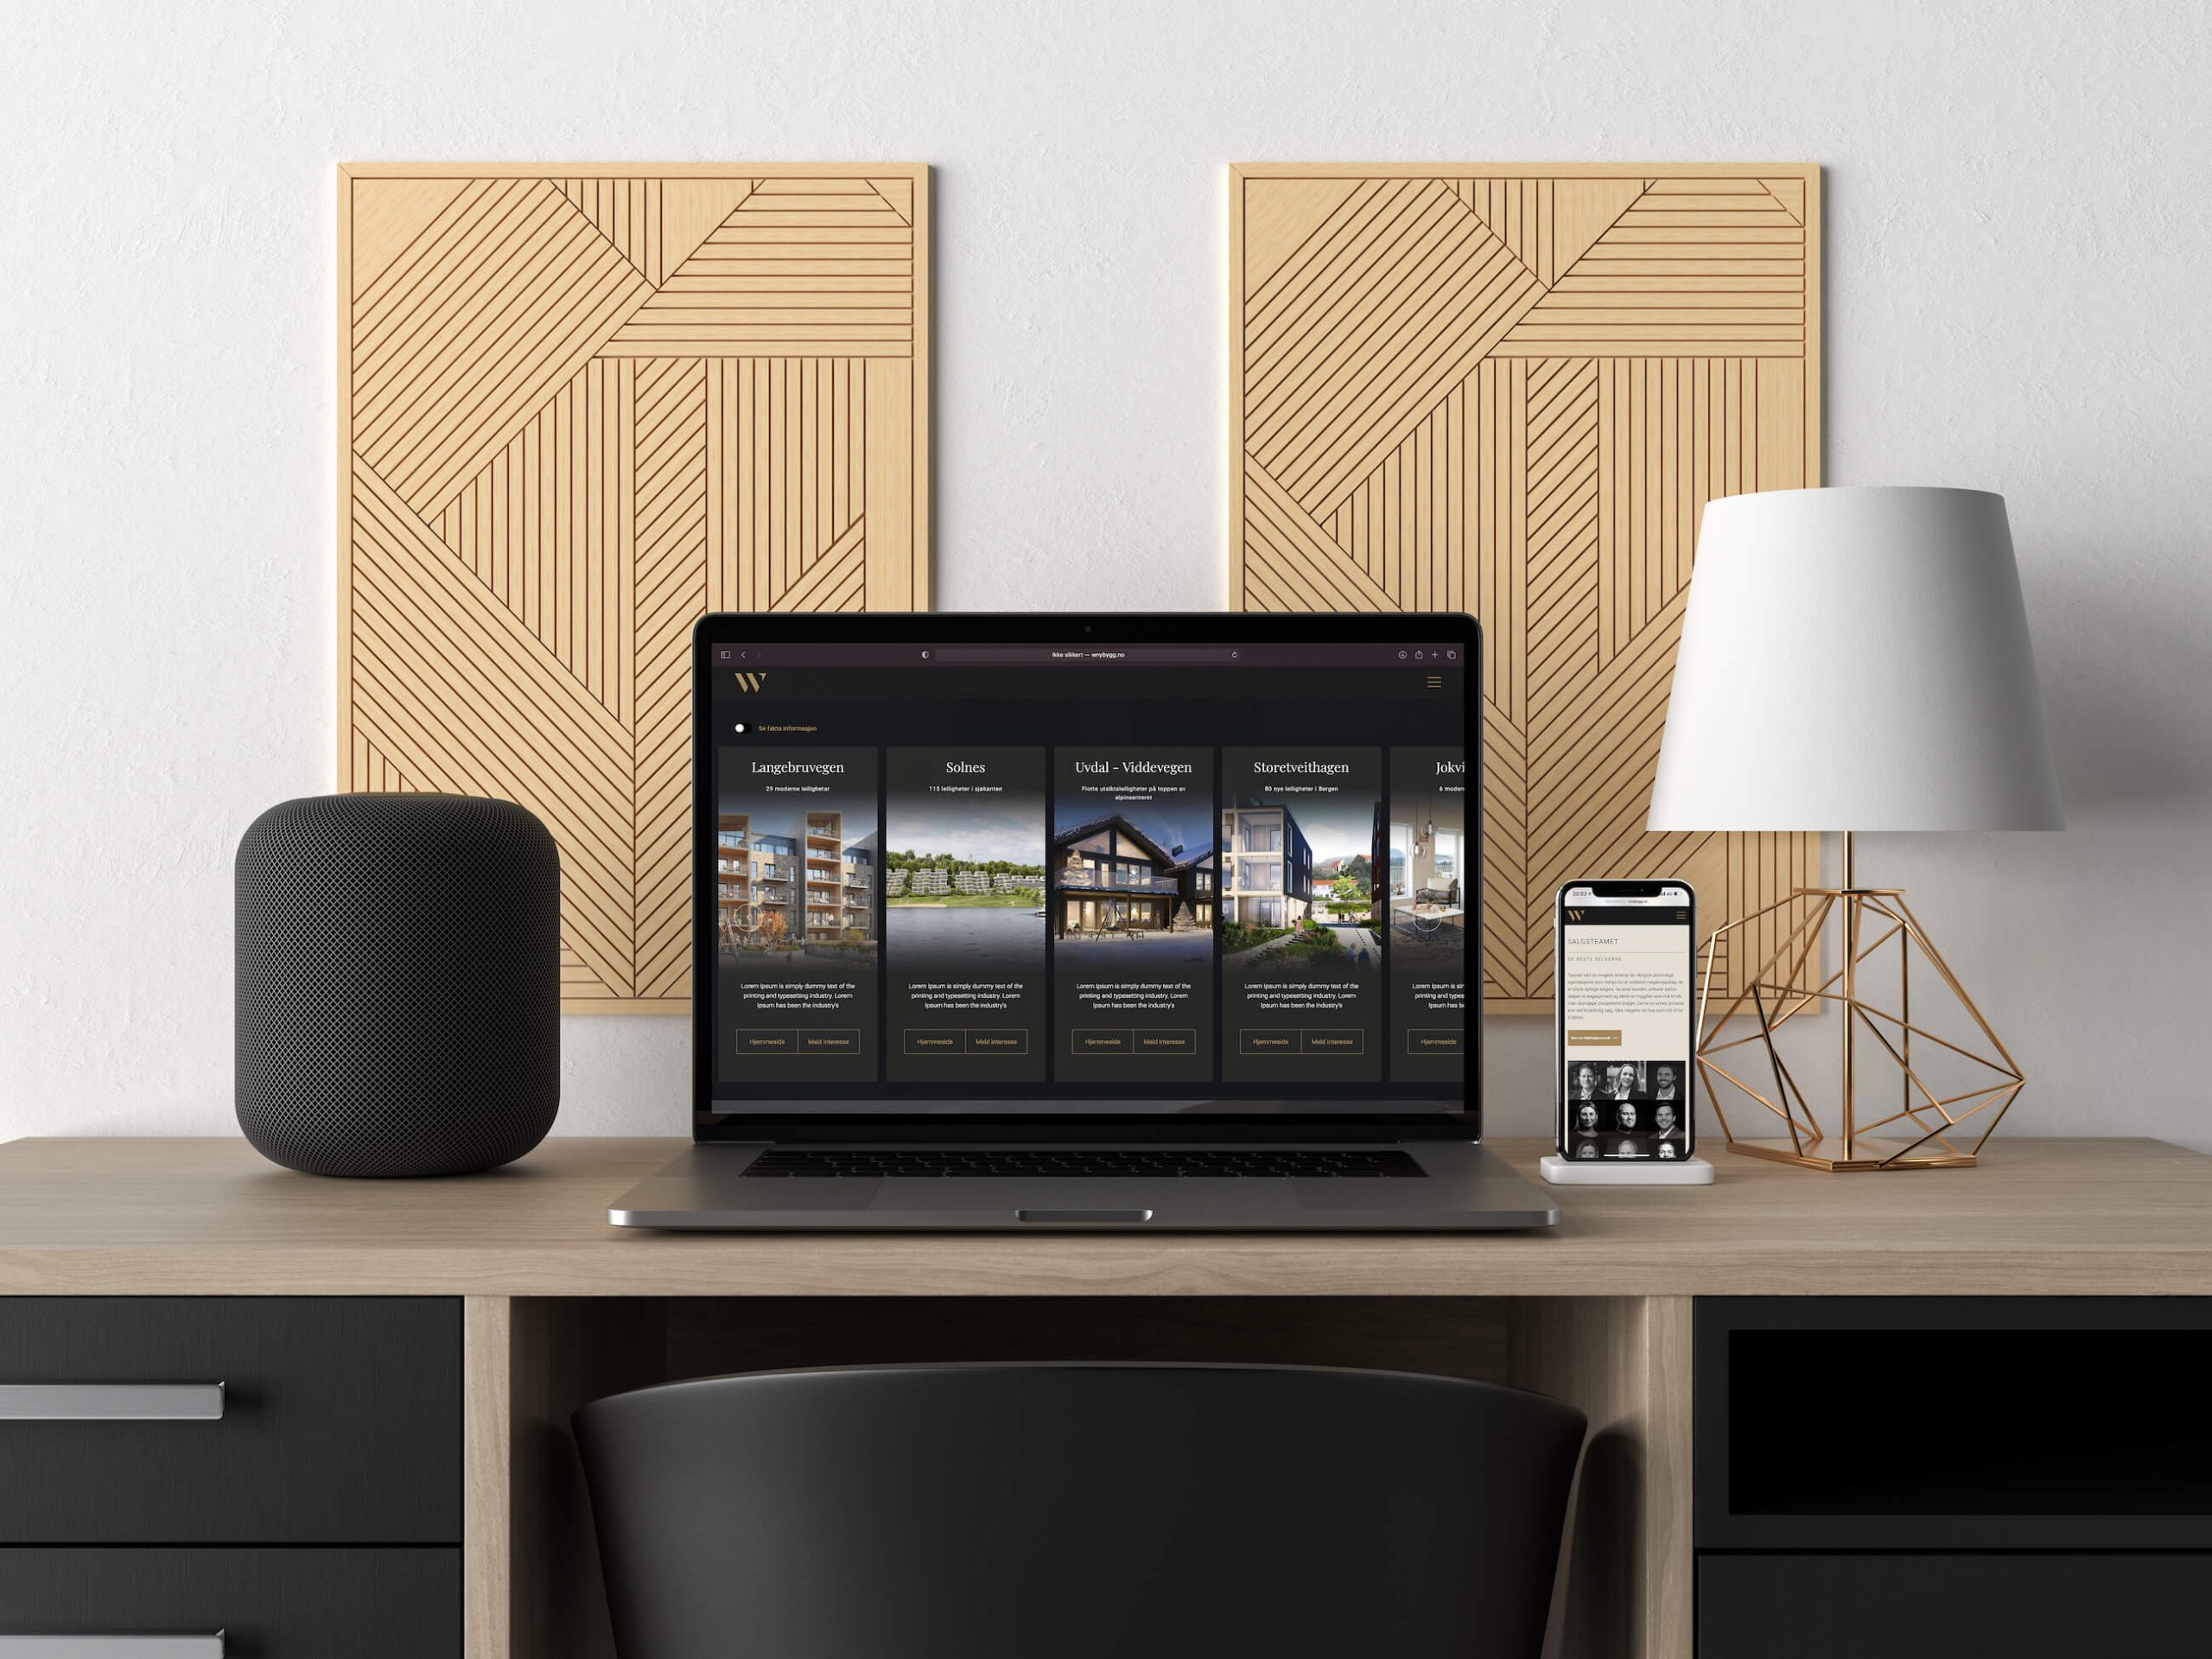 MacBook og iPhone med W Nybygg sin portal